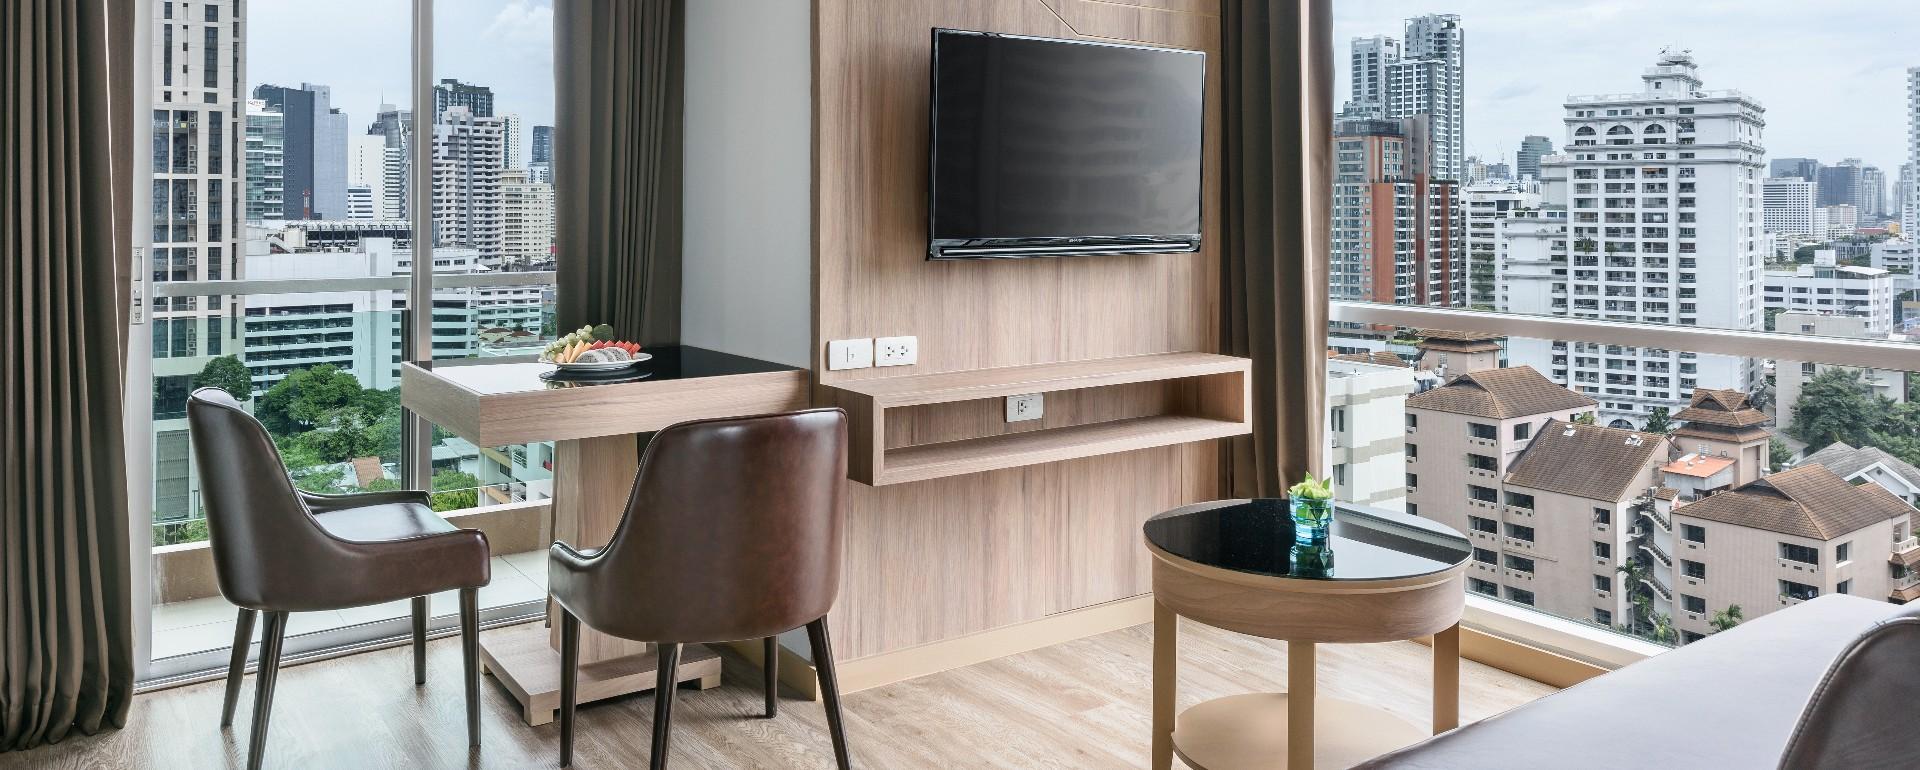 201907 Adelphi Grande Sukhumvit Hotel - Executive One Bedroom Suite Living Area.jpg